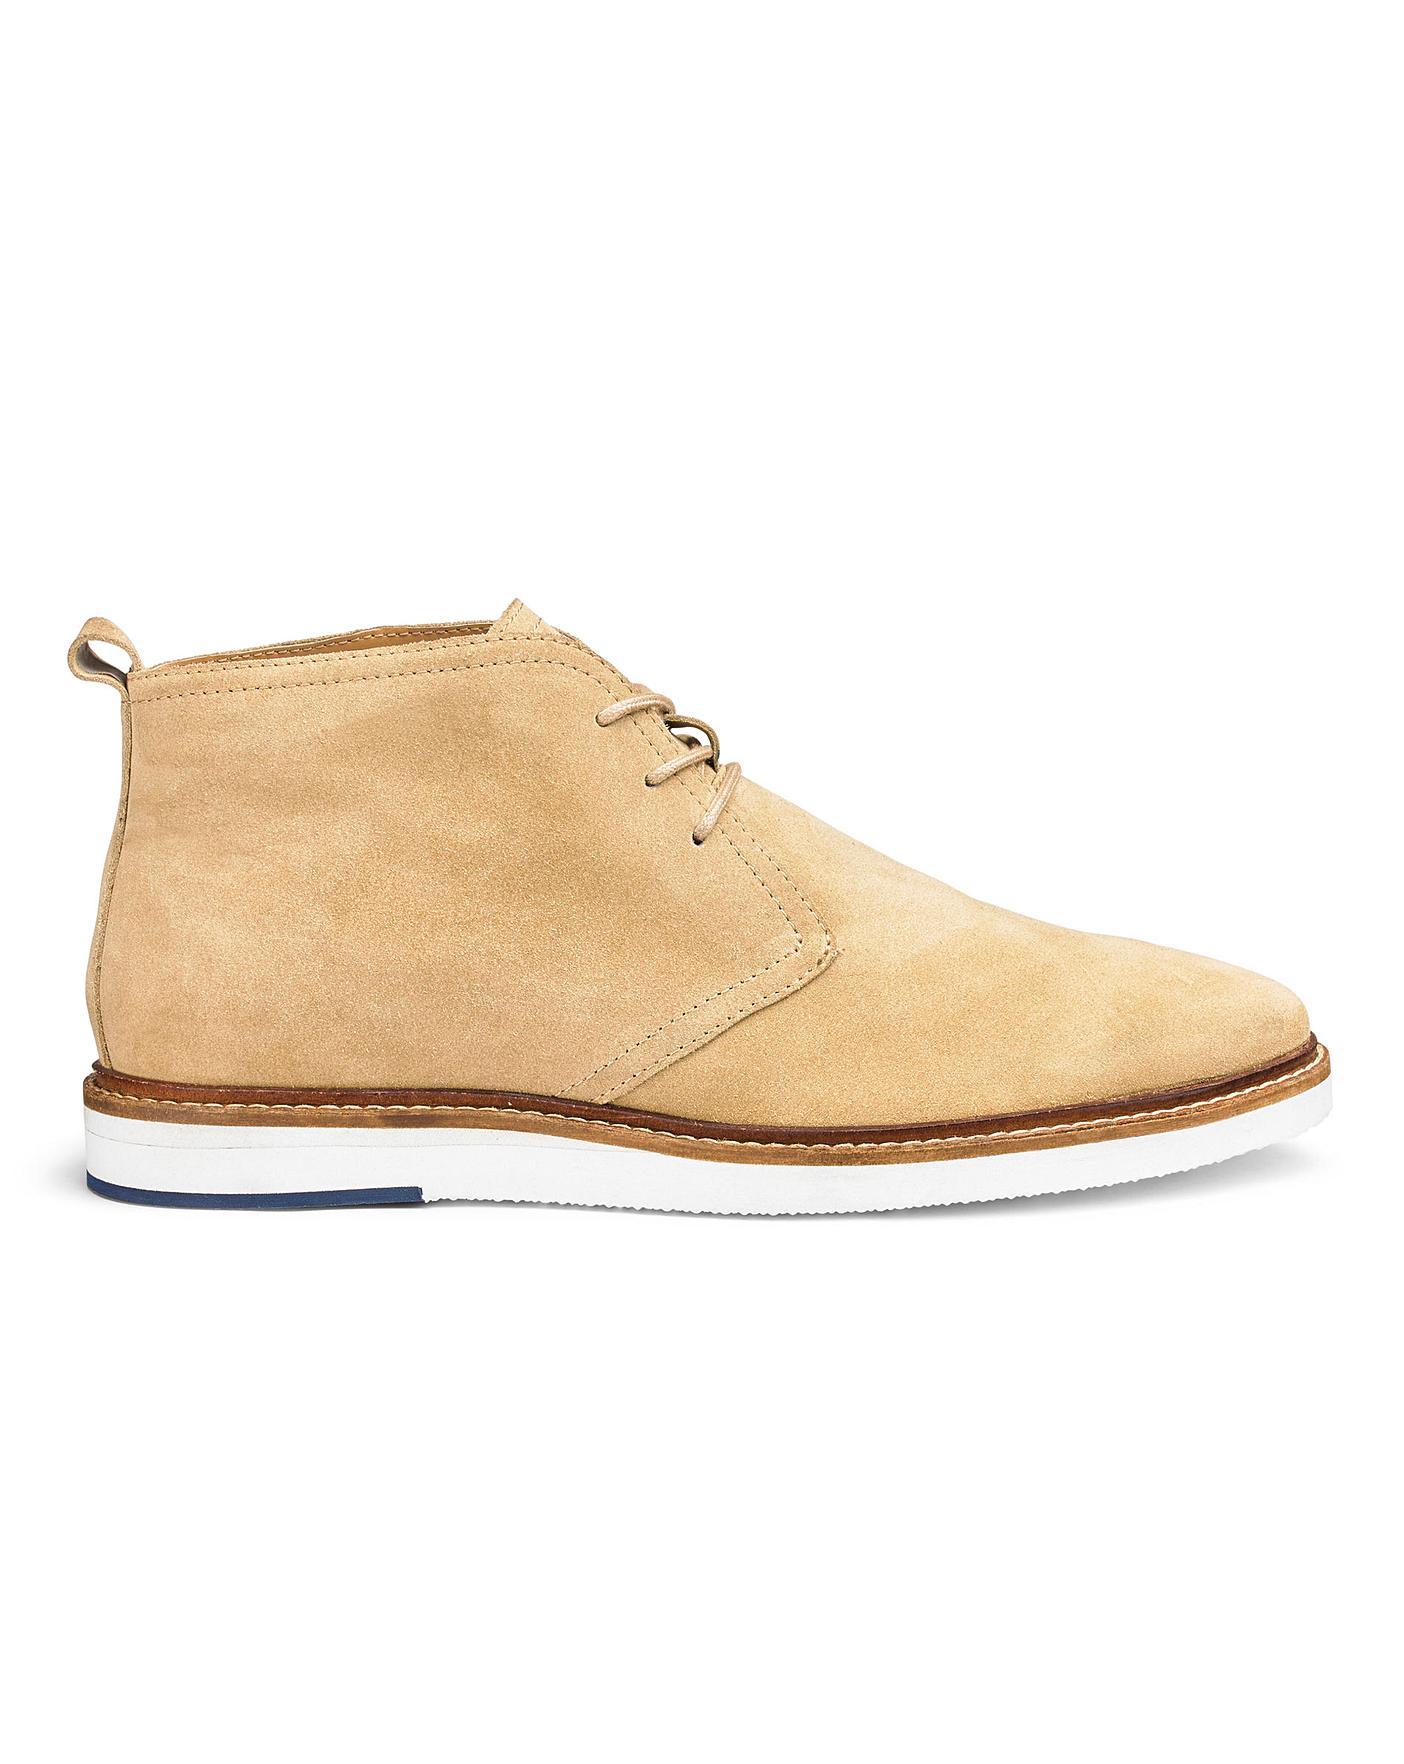 0af8baea784 Jacamo Suede Desert Boots